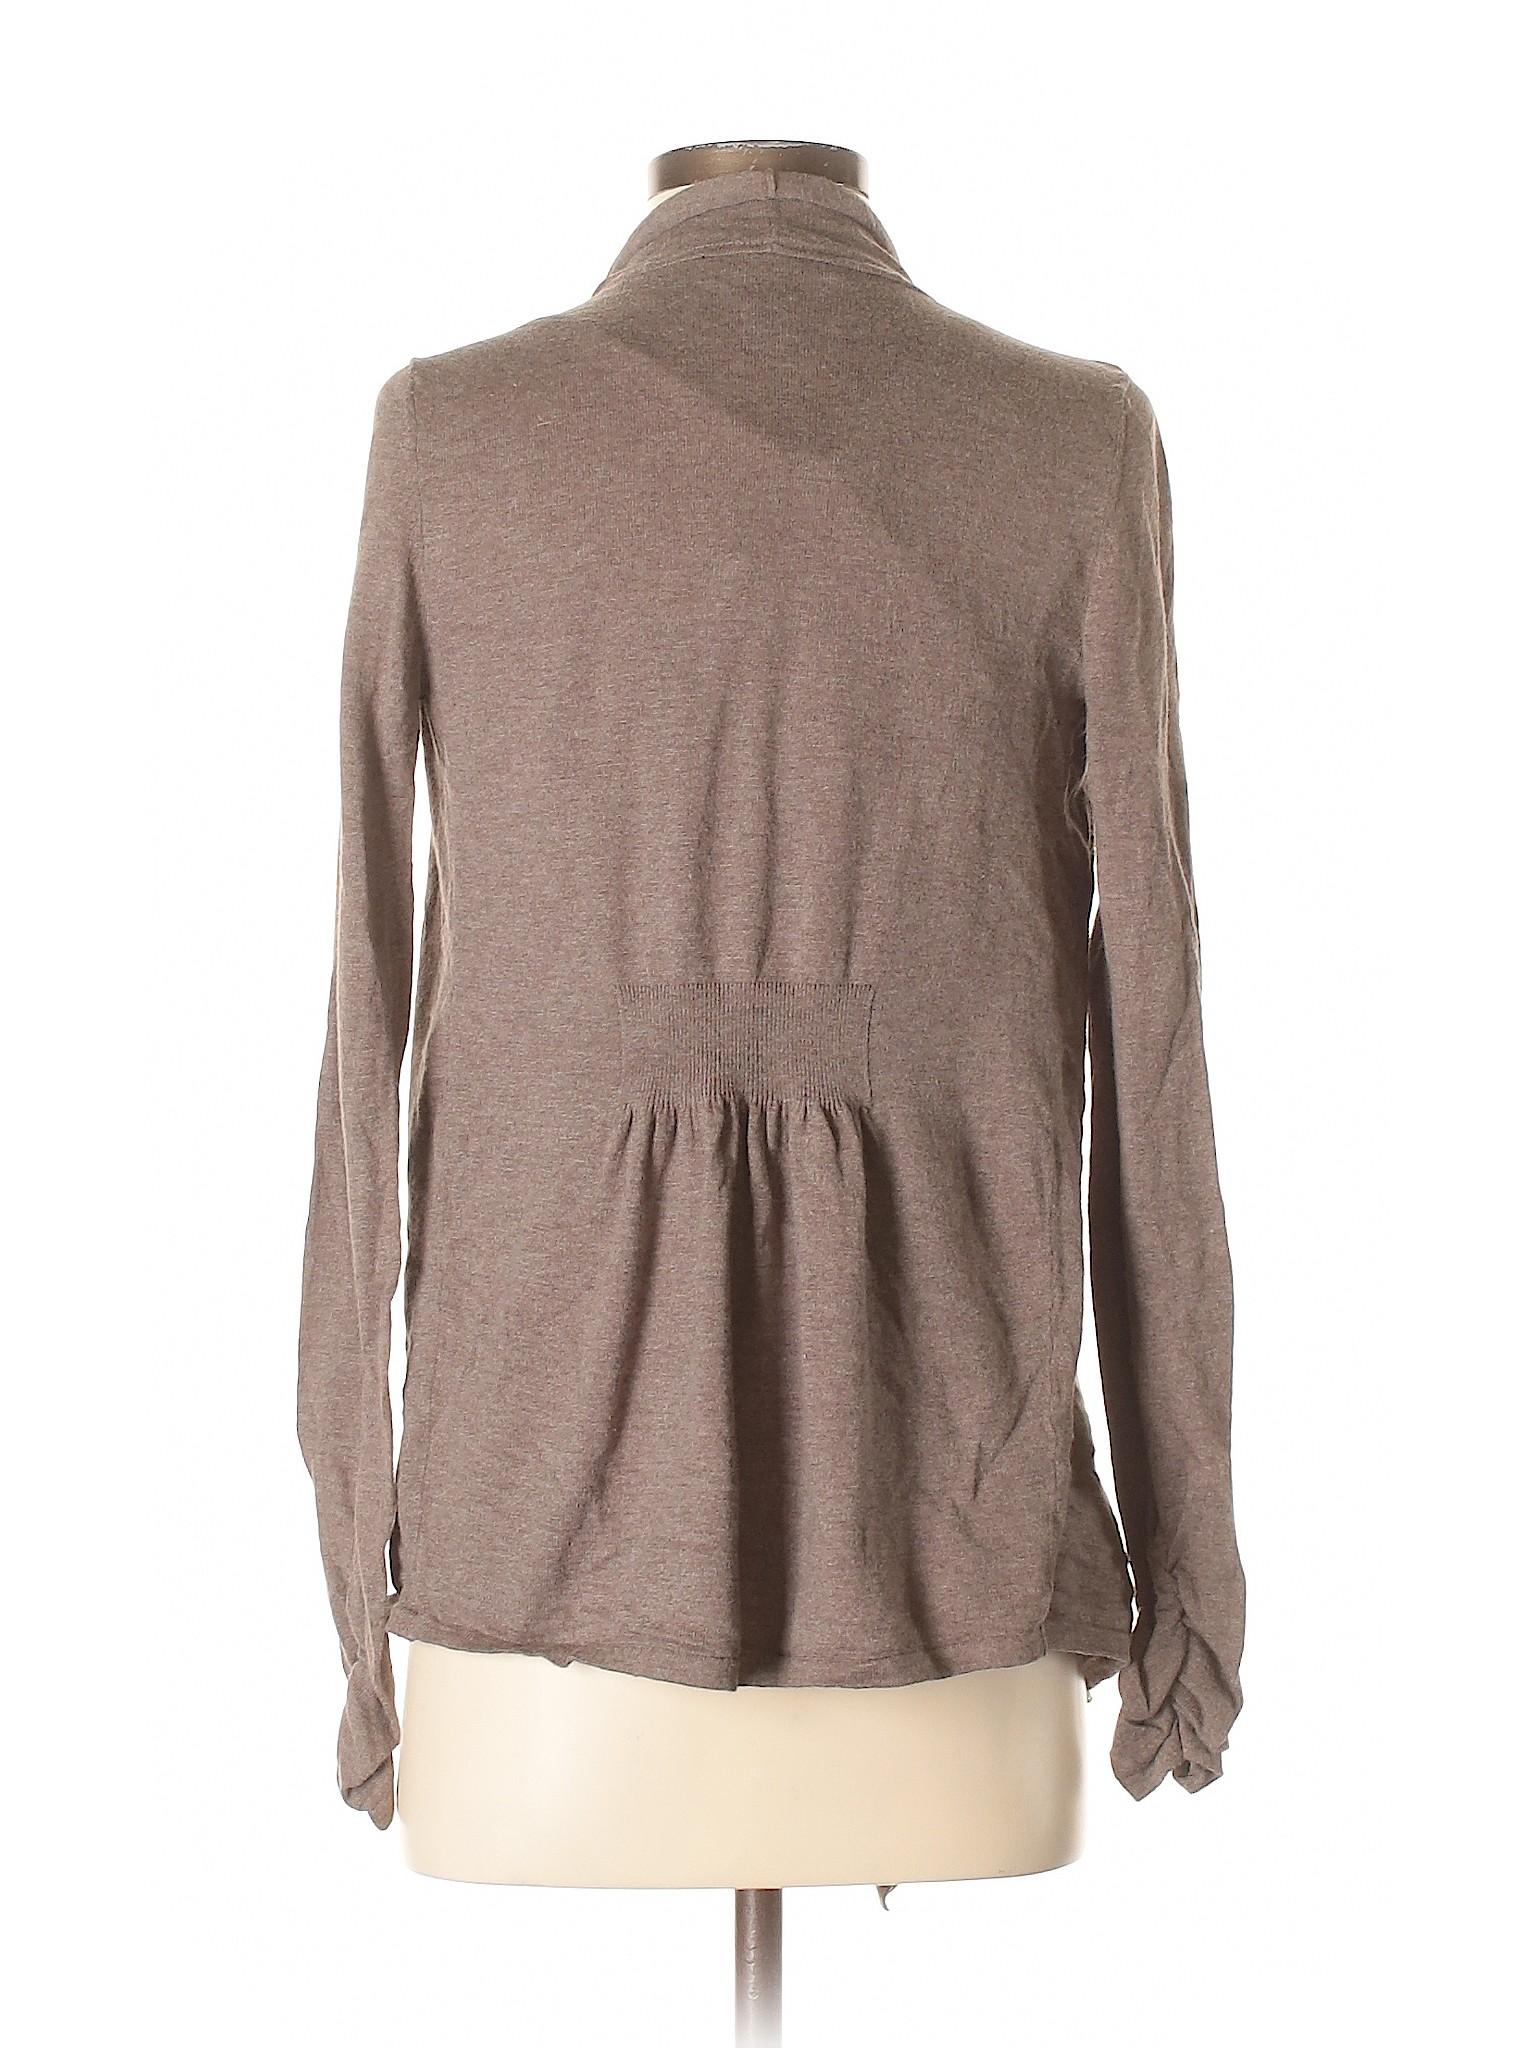 Inca winter winter Cardigan Cottons Cardigan Boutique Inca Inca winter Boutique Cottons Boutique tIww7SxYq